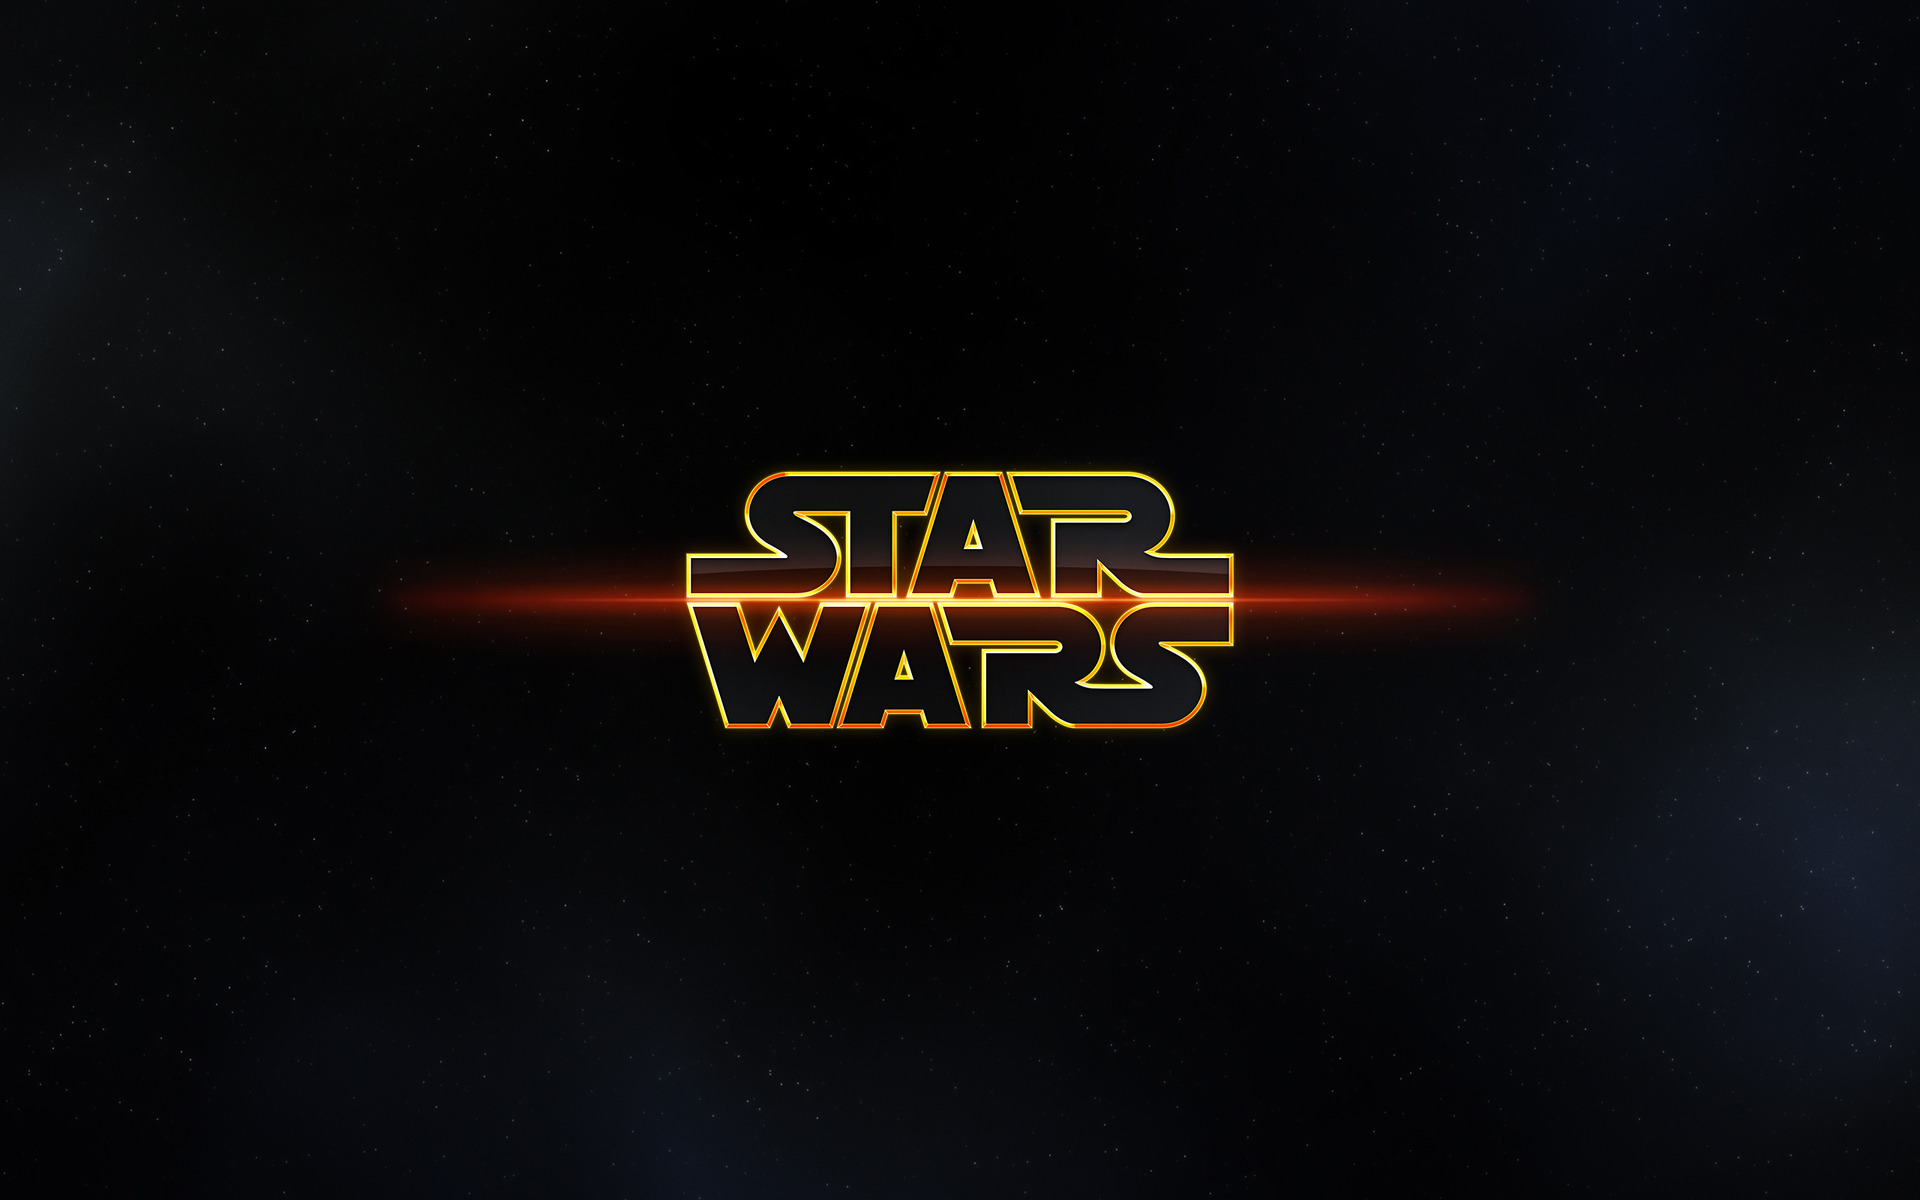 Star Wars HD Desktop Wallpaper 1920x1200